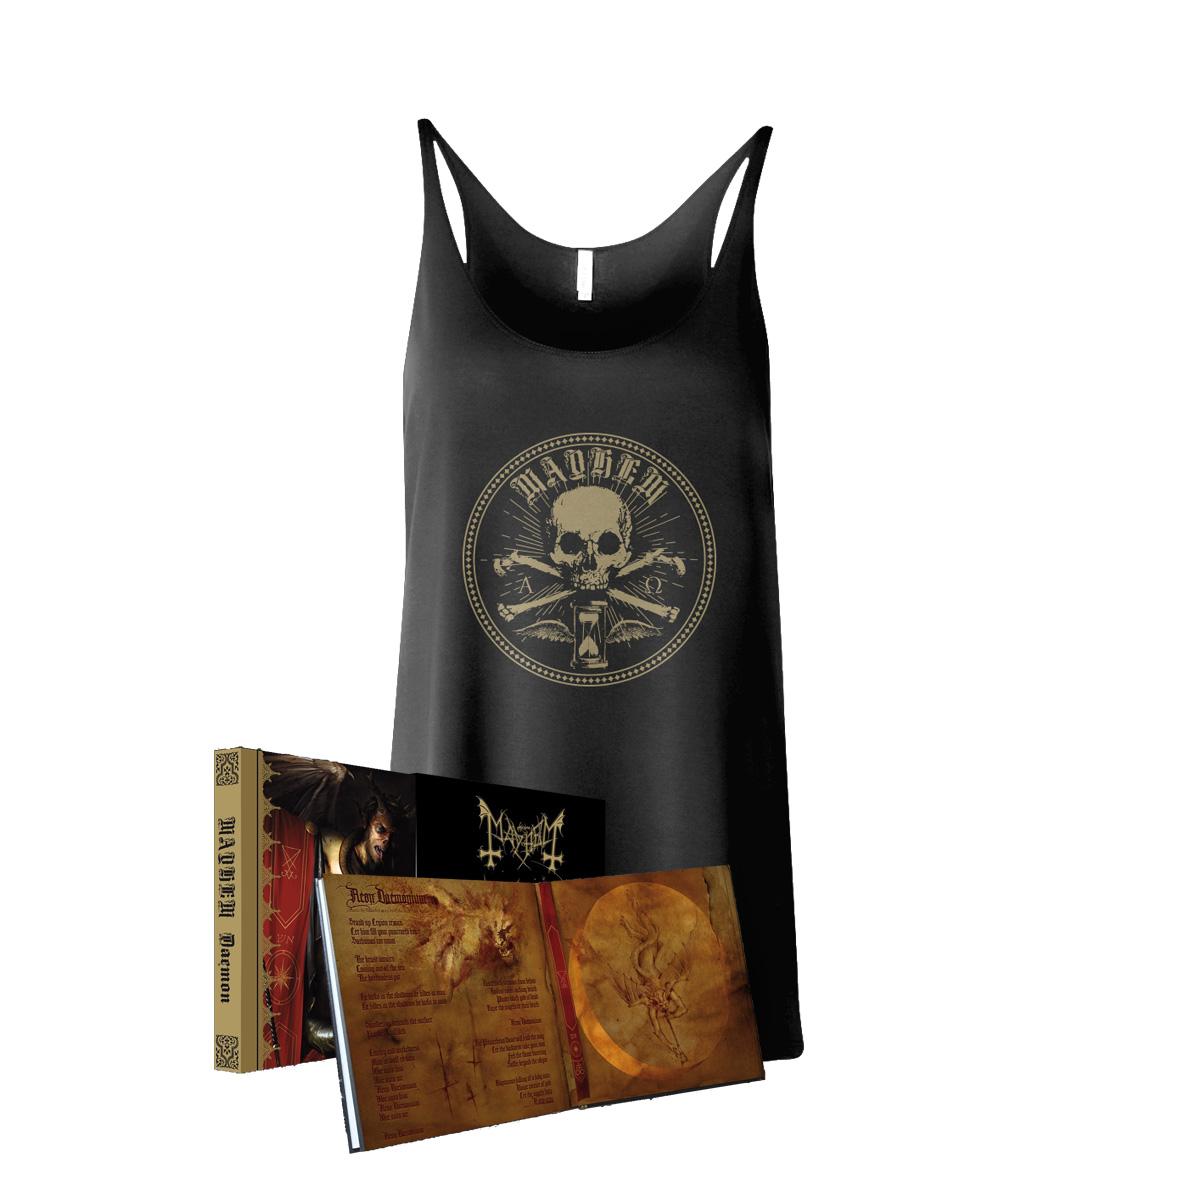 Mayhem - Daemon Mediabook with Slipcase + Sigil Tank Top